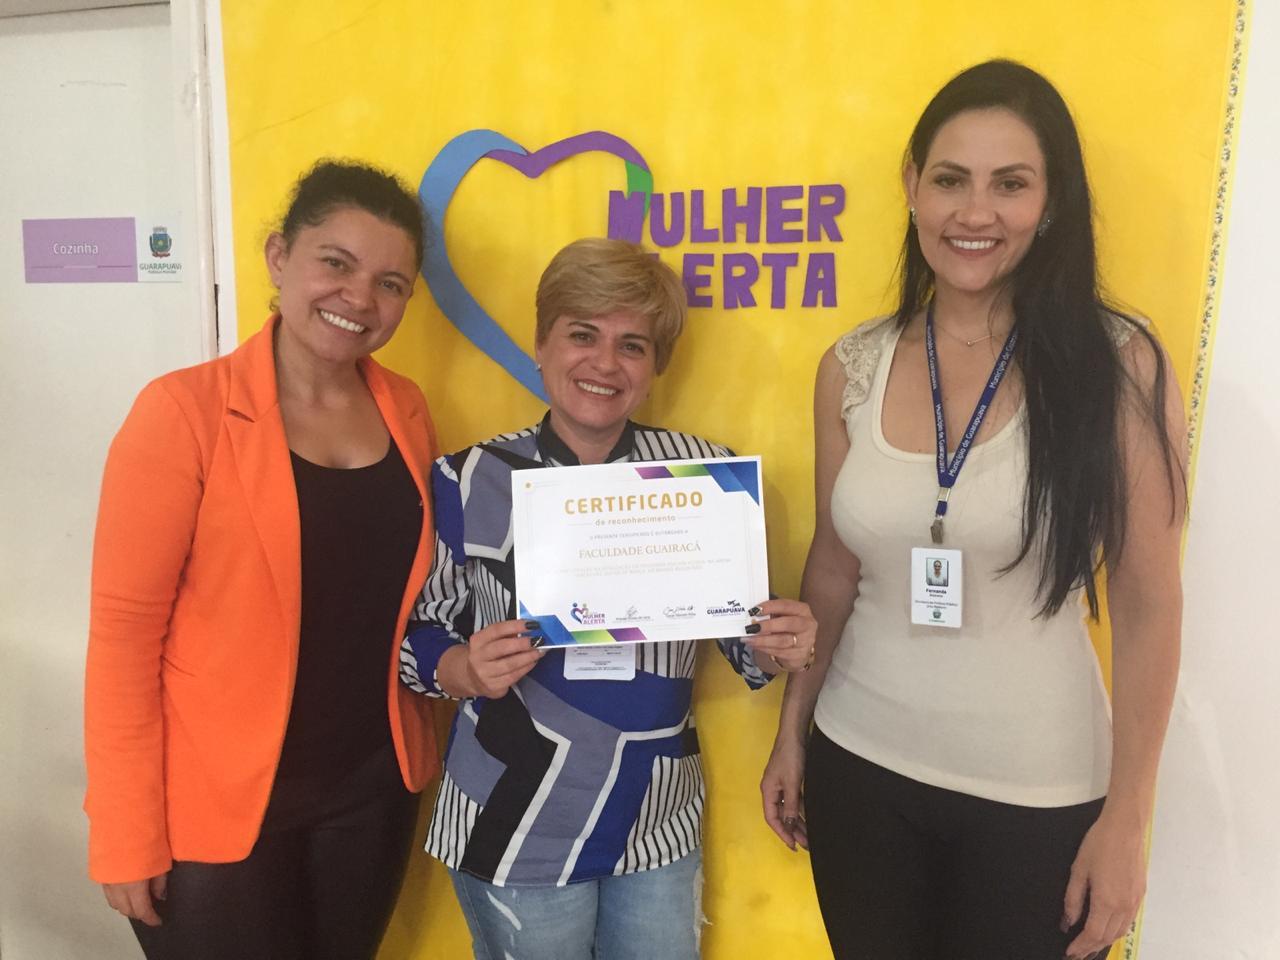 Mulher Alerta: Faculdade Guairacá recebe certificado de reconhecimento